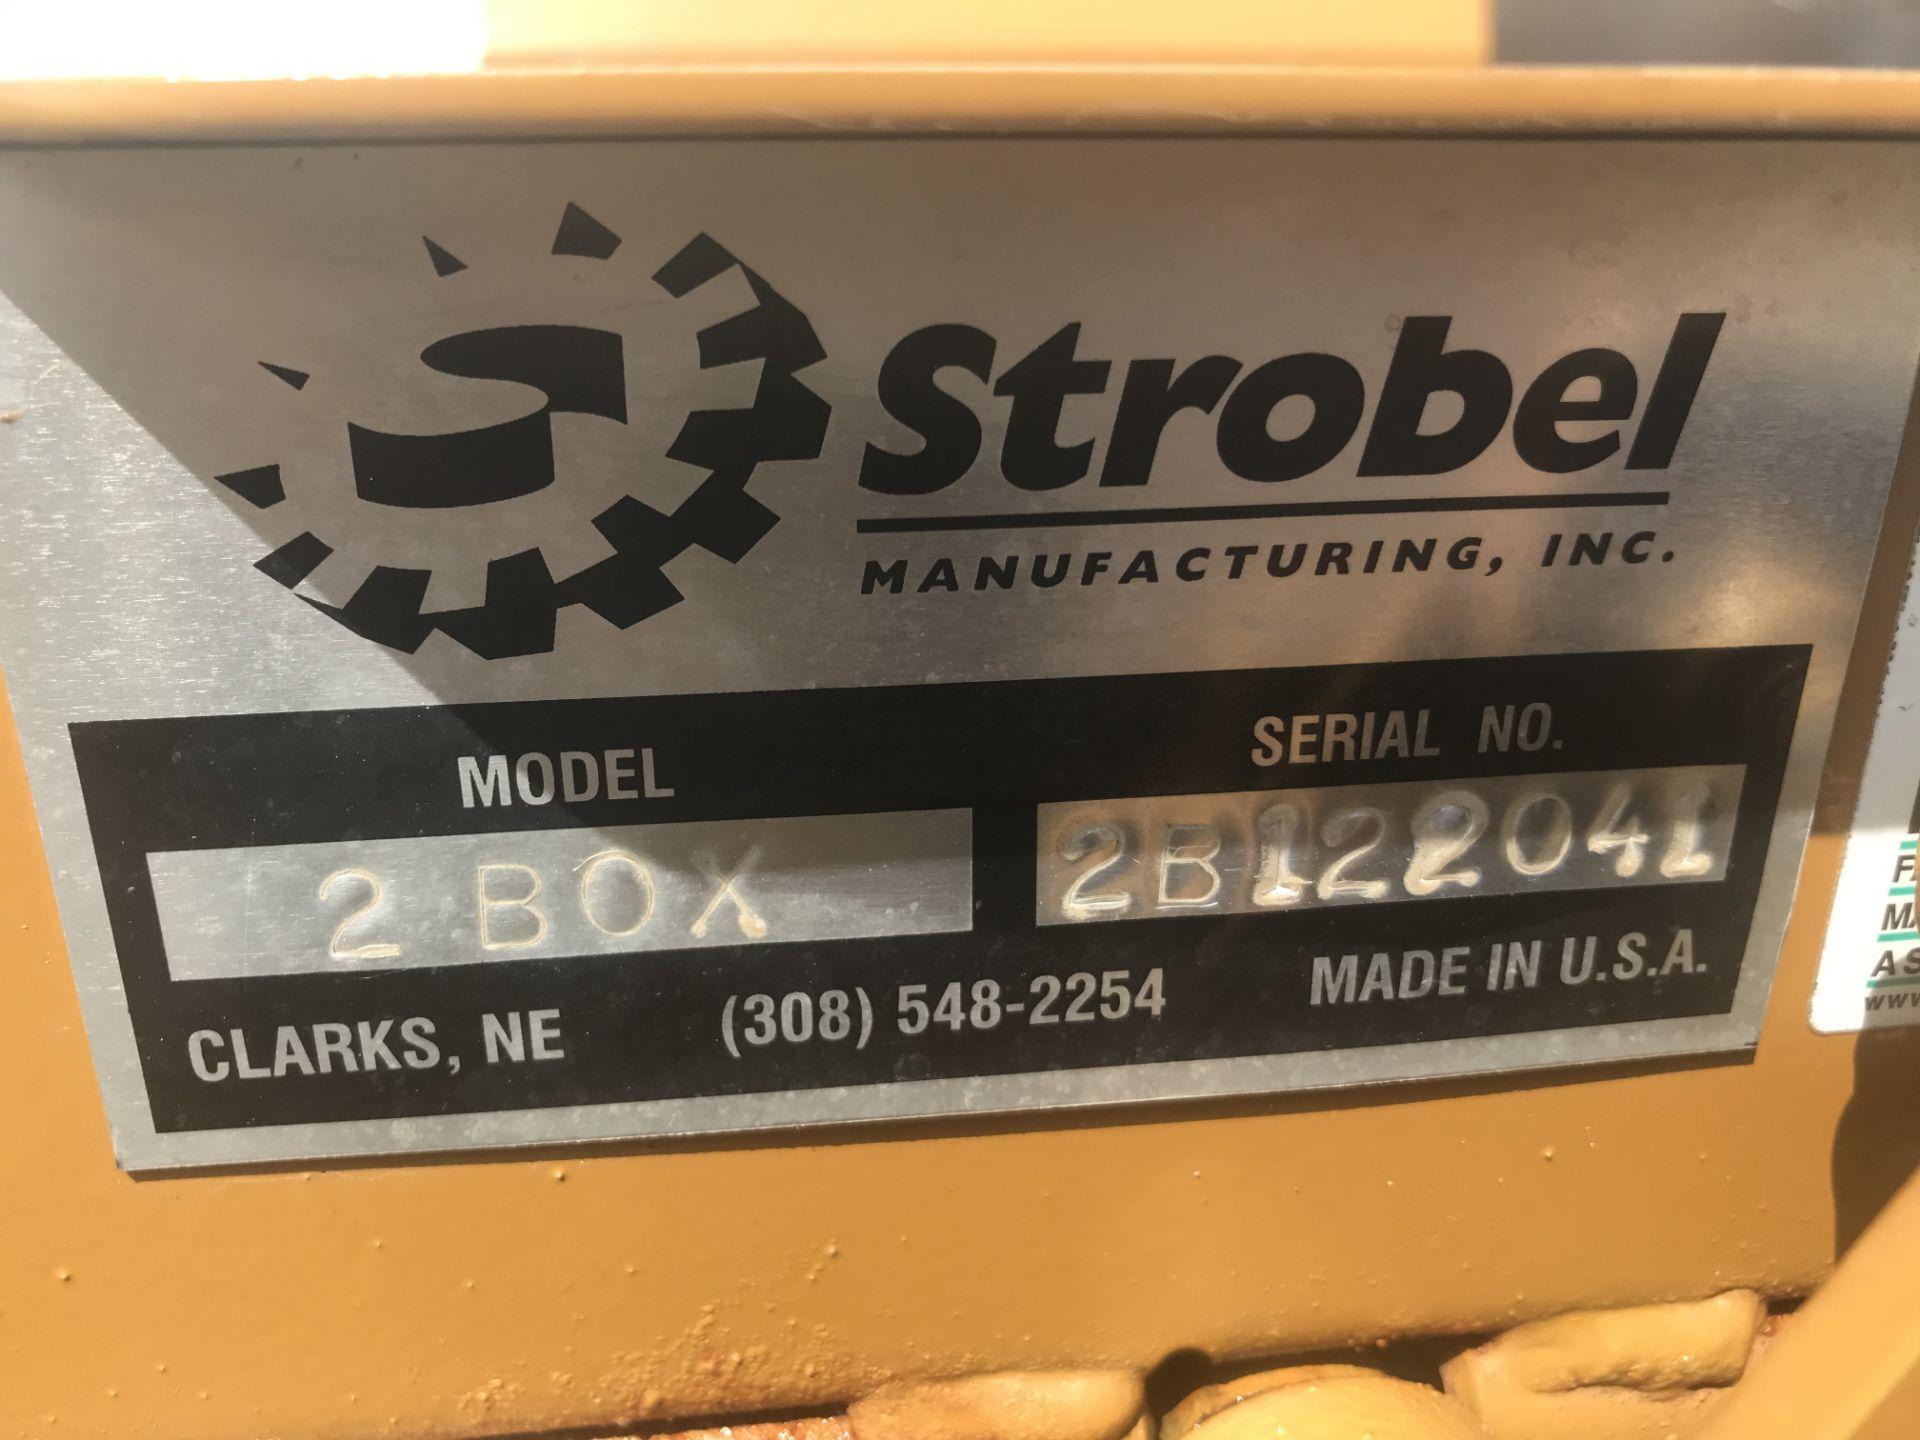 Lot 30 - 2012 Strobel Mdl.2 Box Seed Tender S#2B122041, Hyd. Fold Auger, Honda GX160 Elec. Start (1 owner).